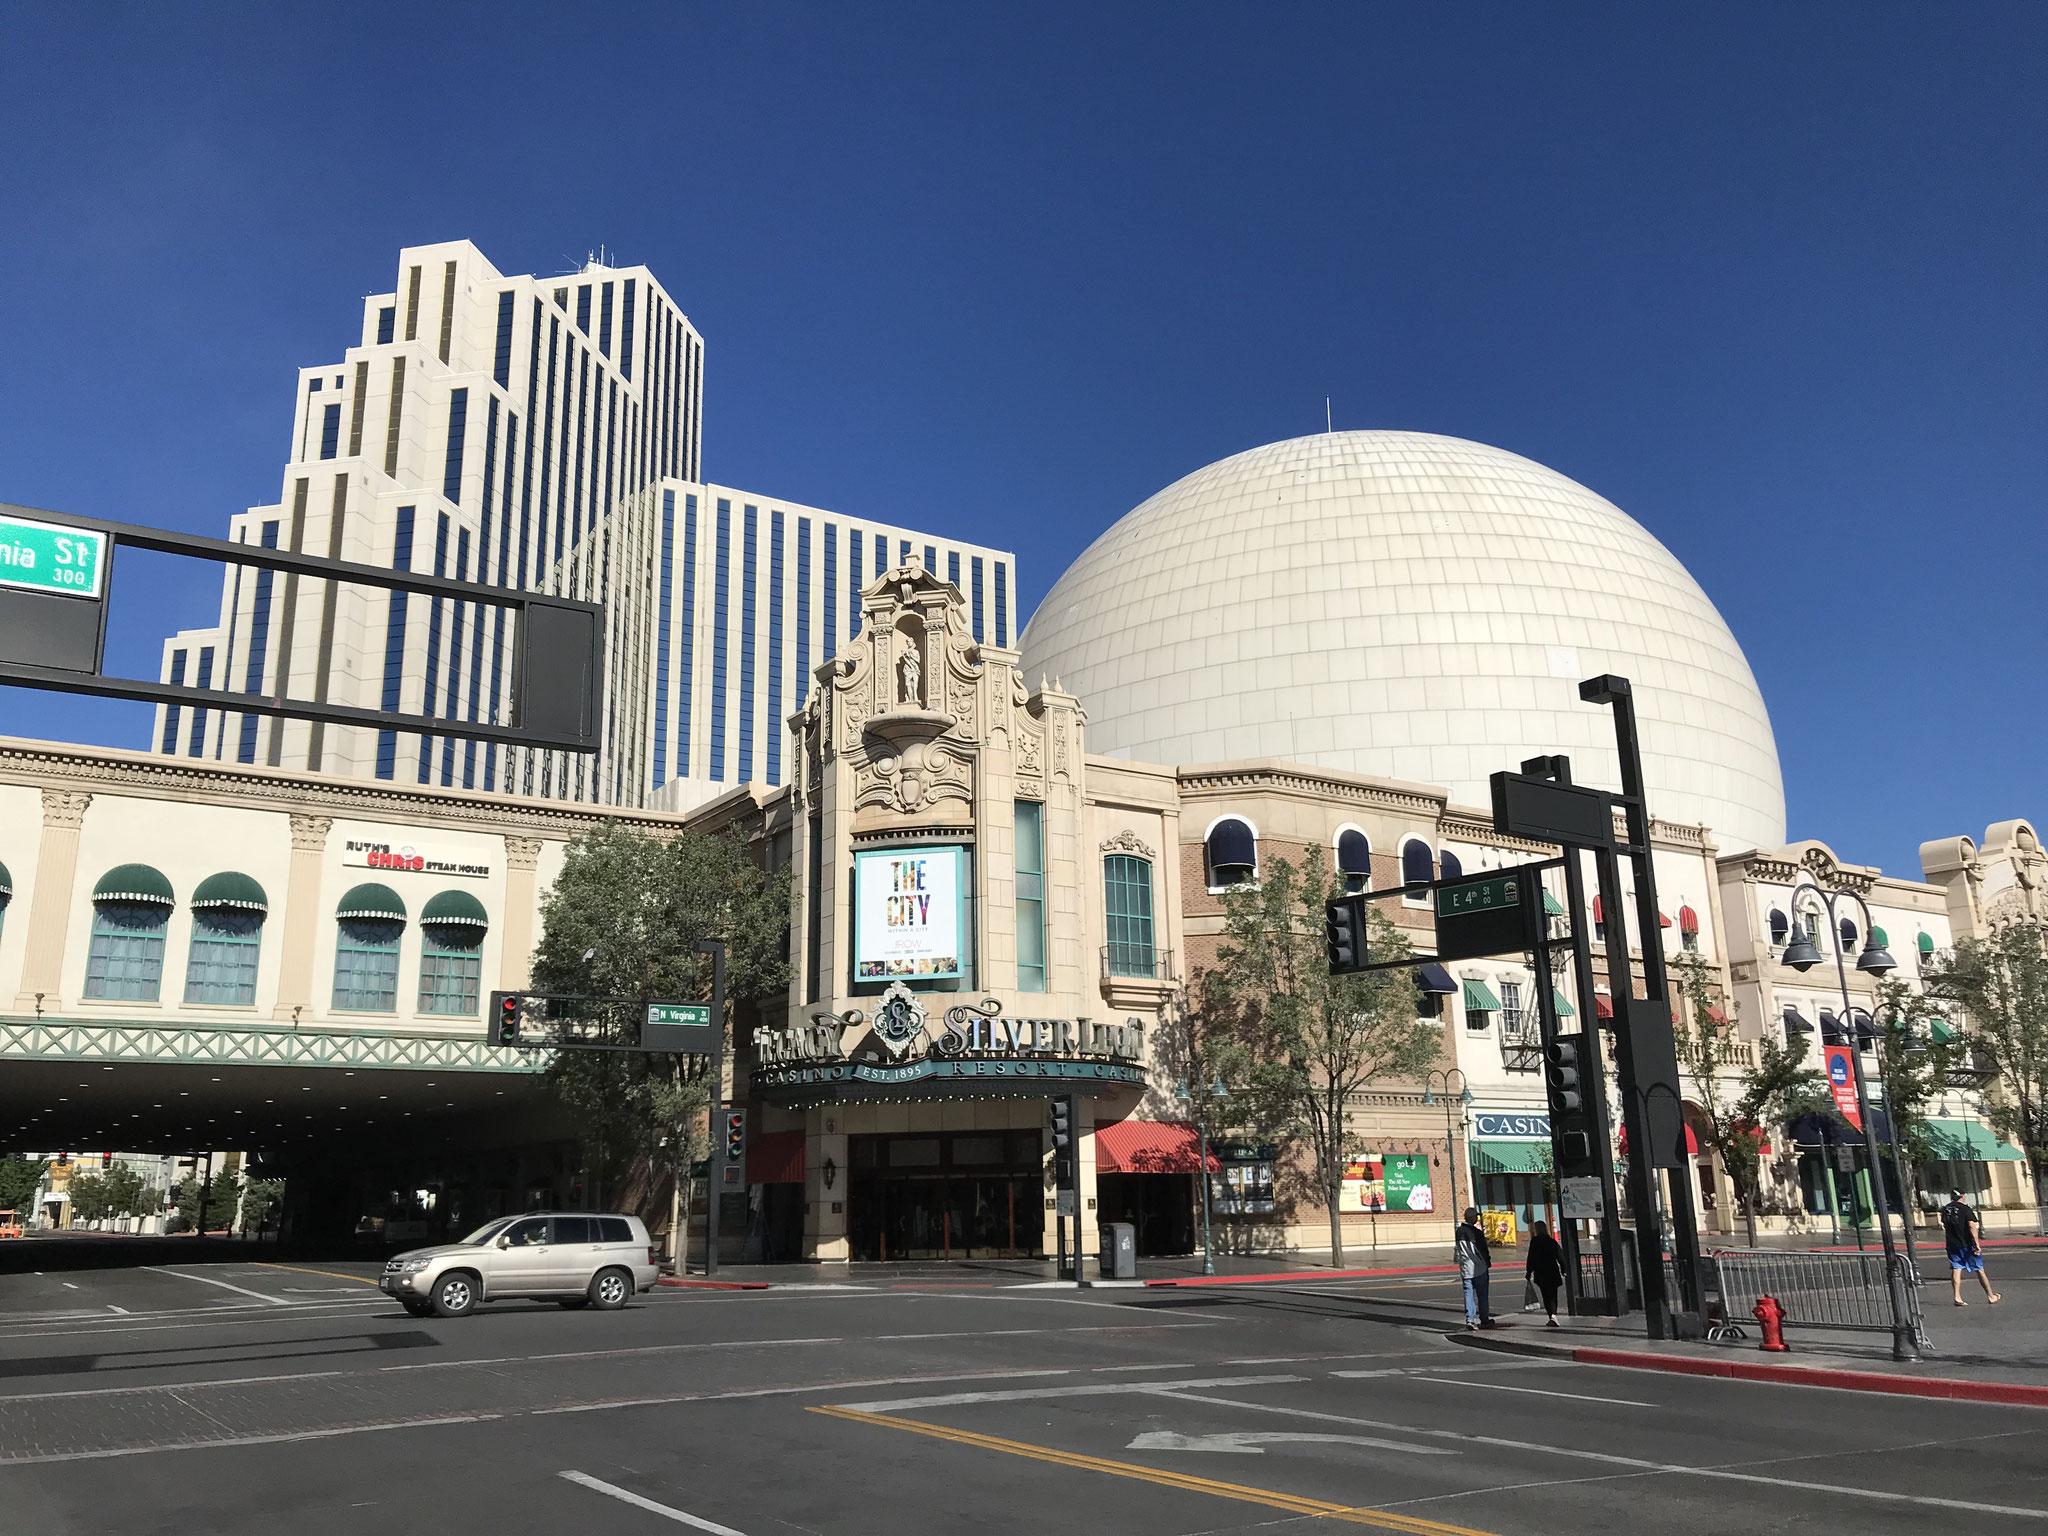 Casino Hotels in Reno Downtown